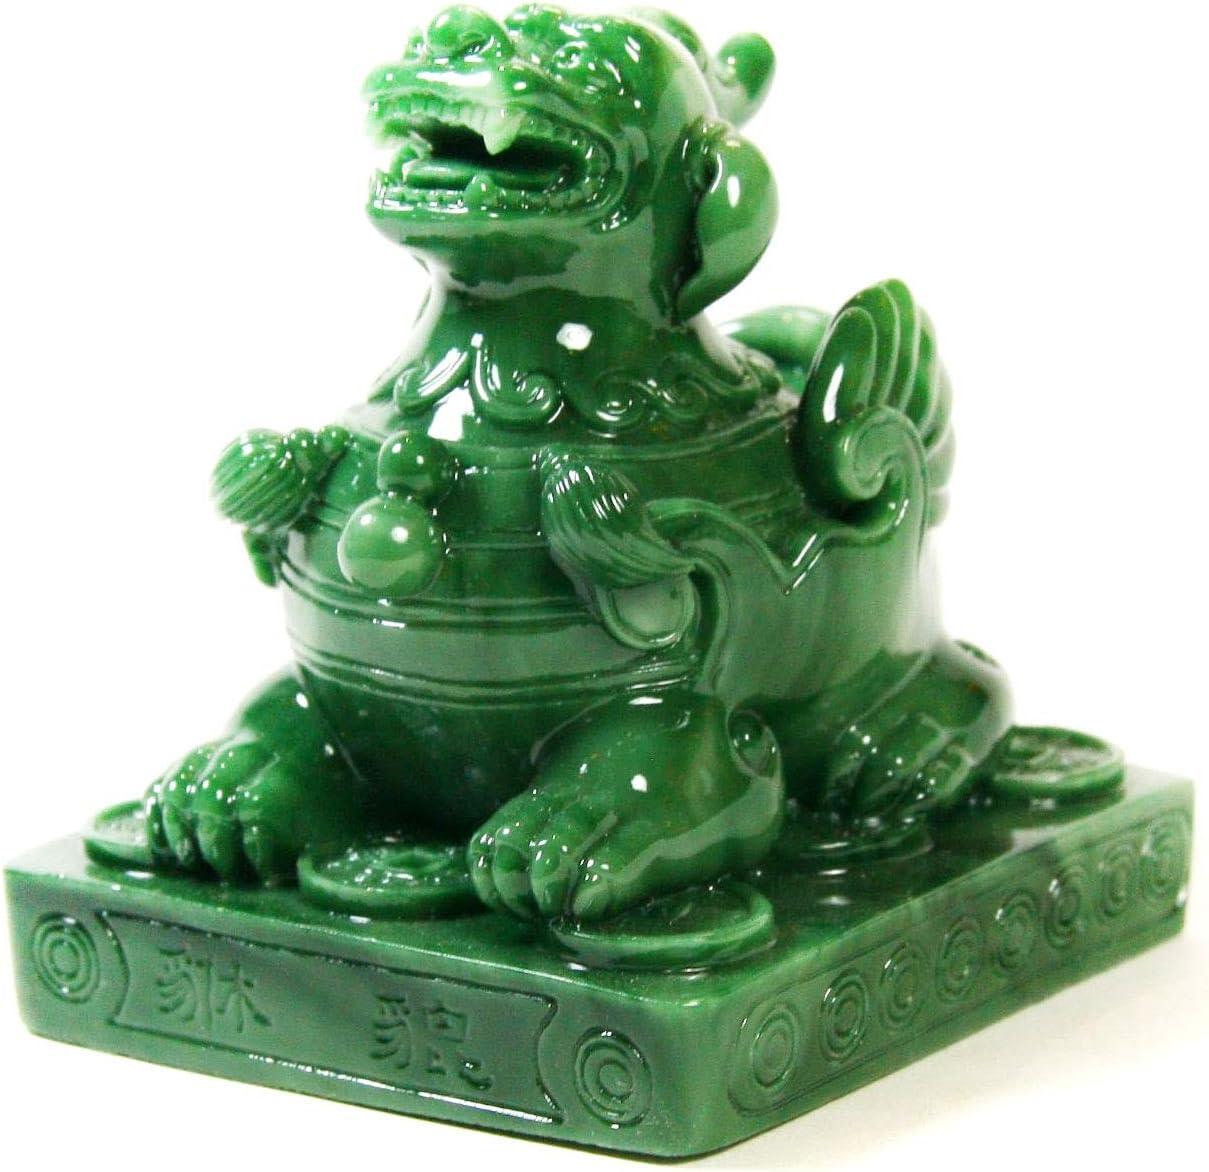 Estatua de Pi Xiu color verde Art Saigon Feng Shui El quinto Animal de la mitolog/ía china S/ímbolo de Fortuna y de riqueza altura 12,5 cm ref. GK2412